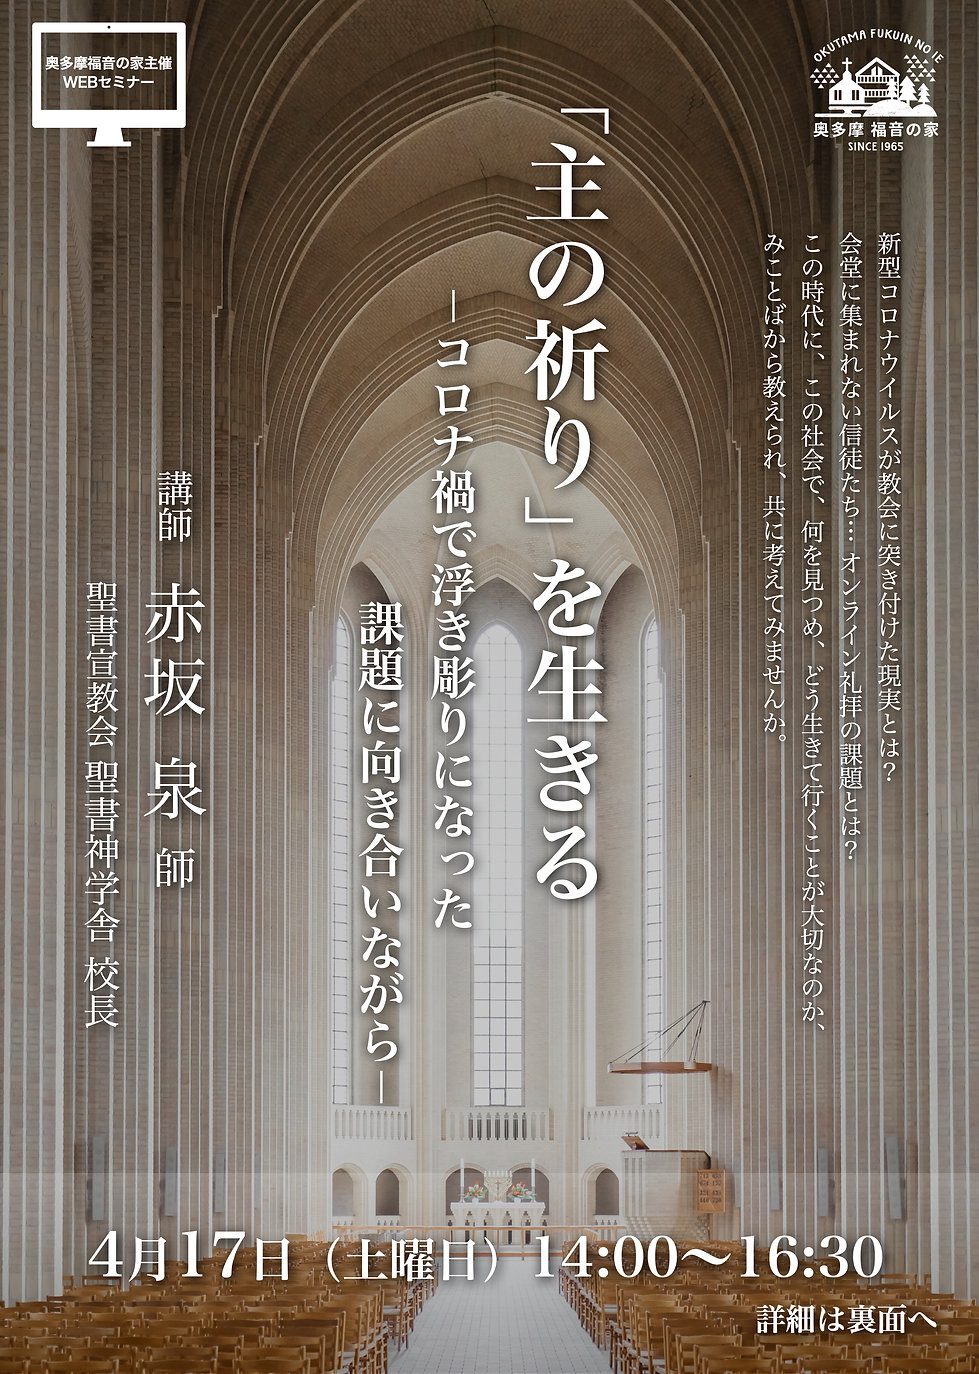 奥多摩Webセミナー 赤坂師 2021 最終版 表.jpg